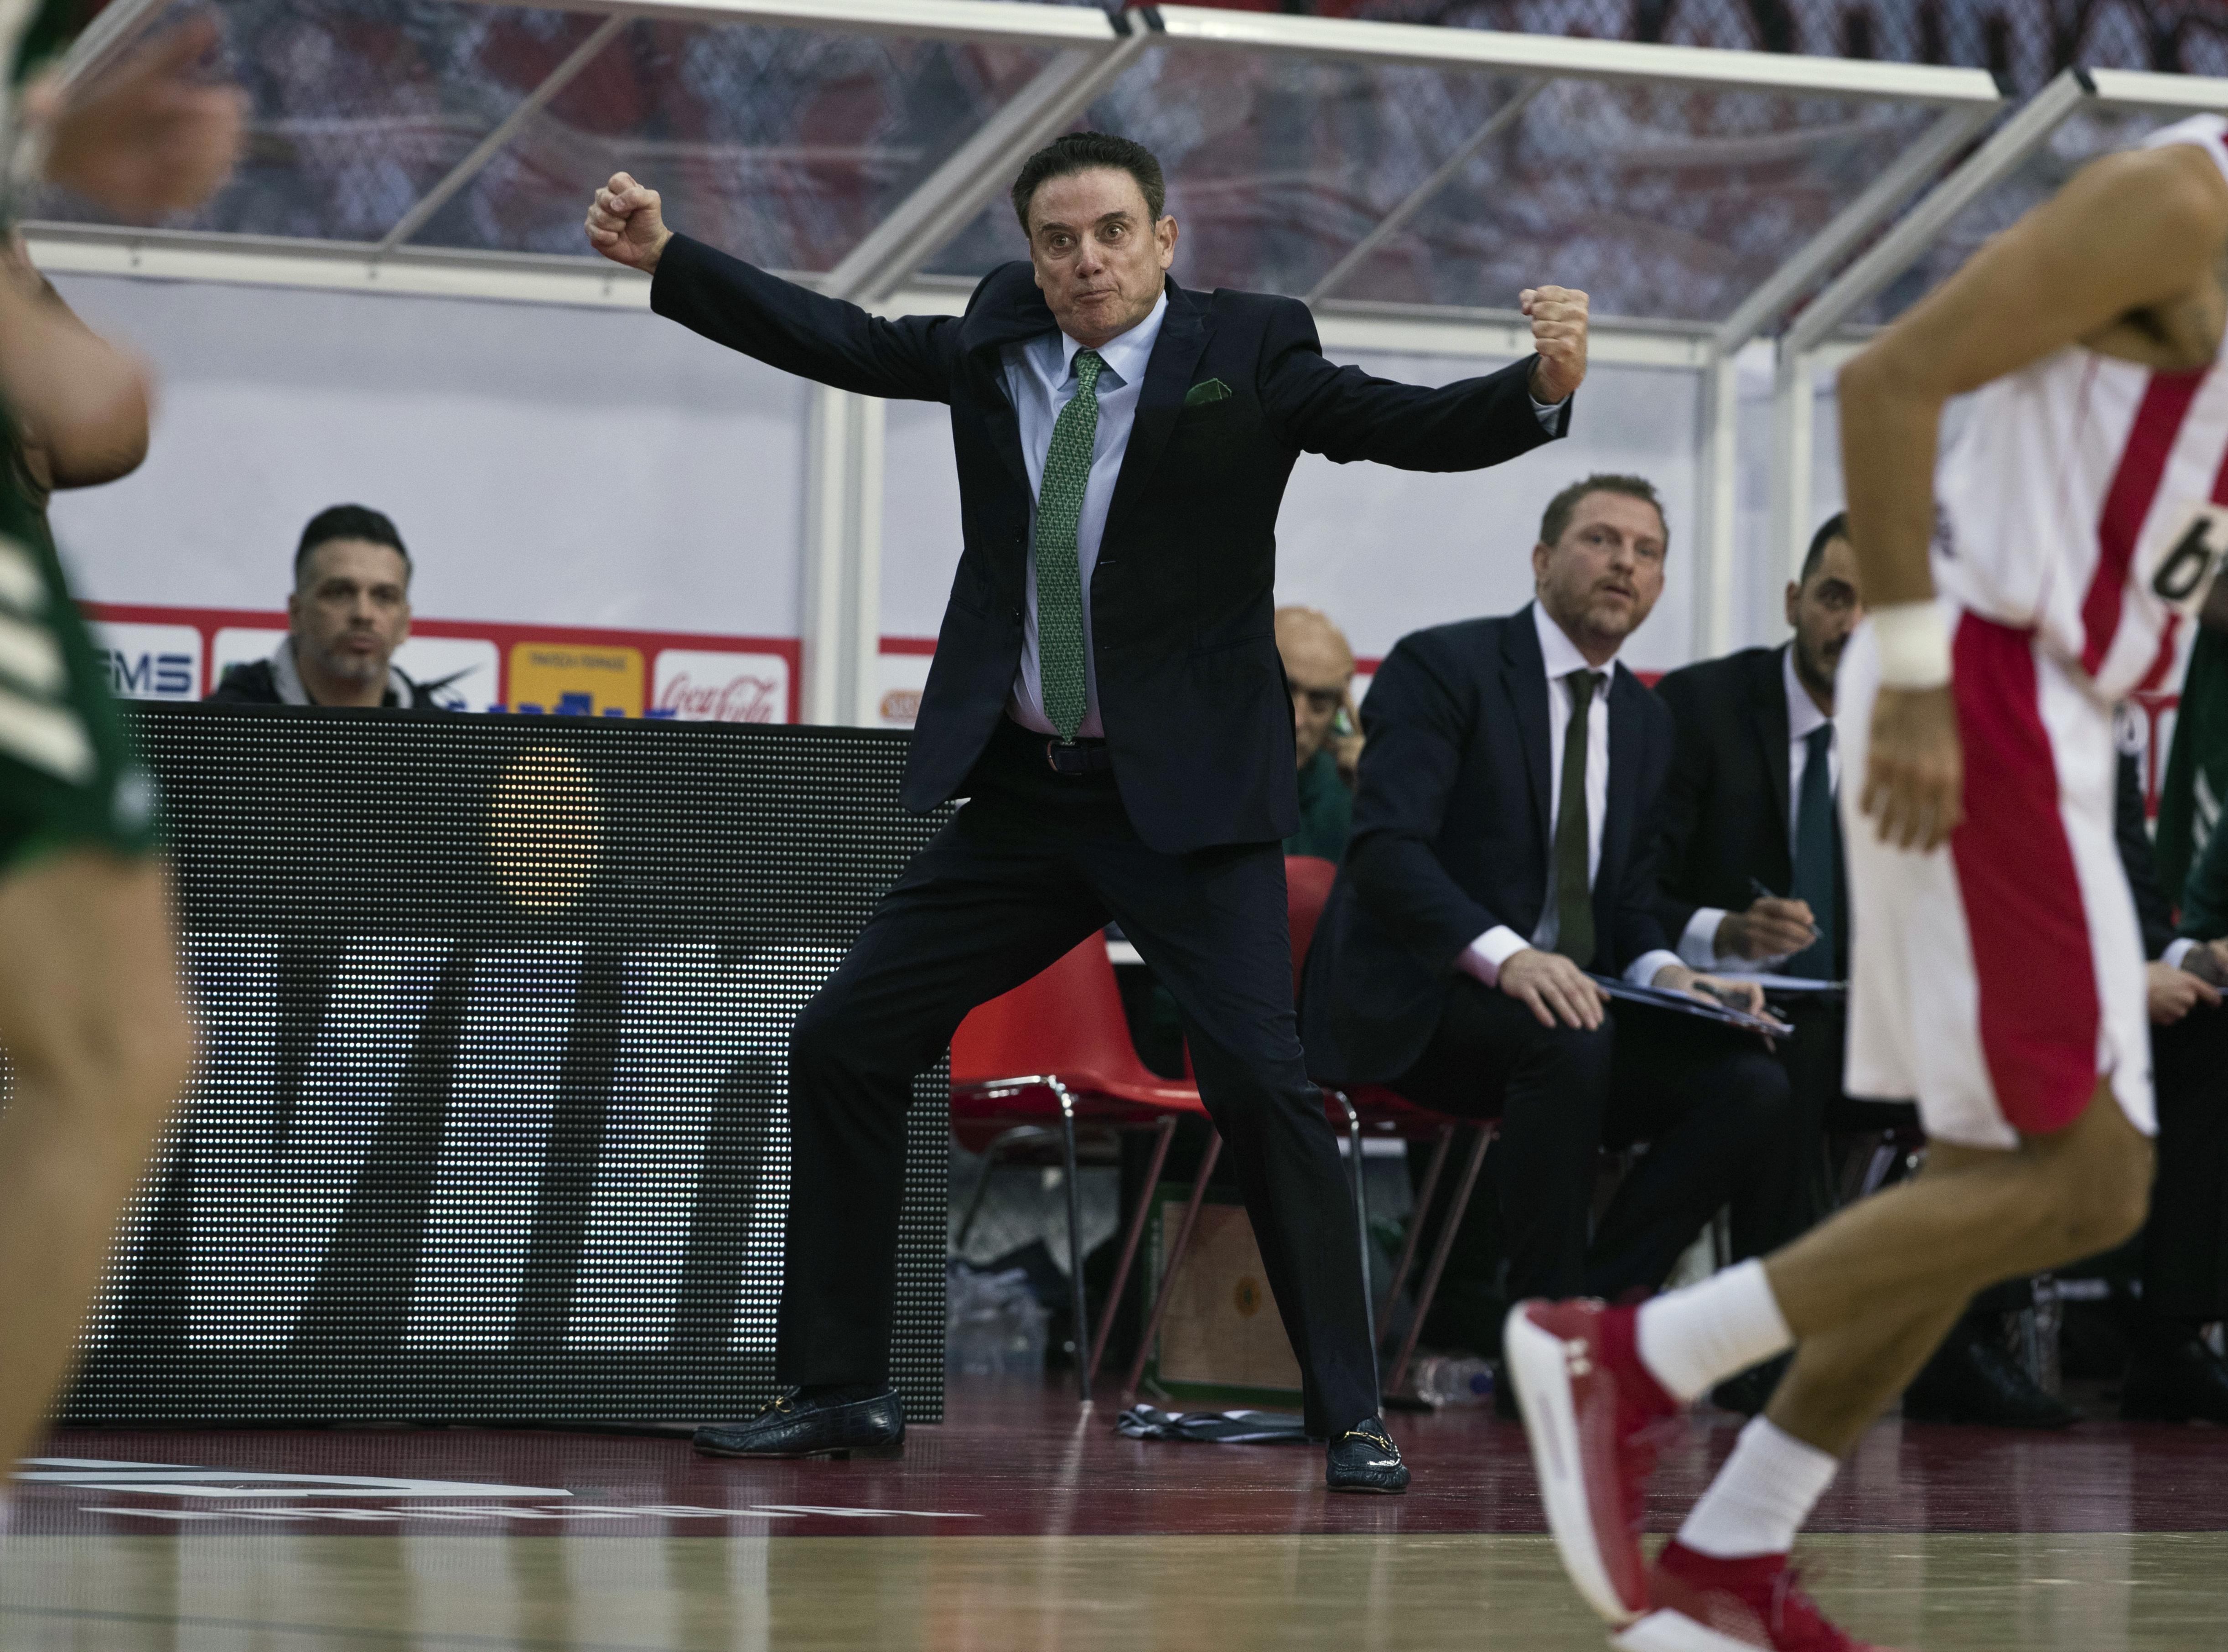 Pitino's Greek team reaches final after walkout on refs